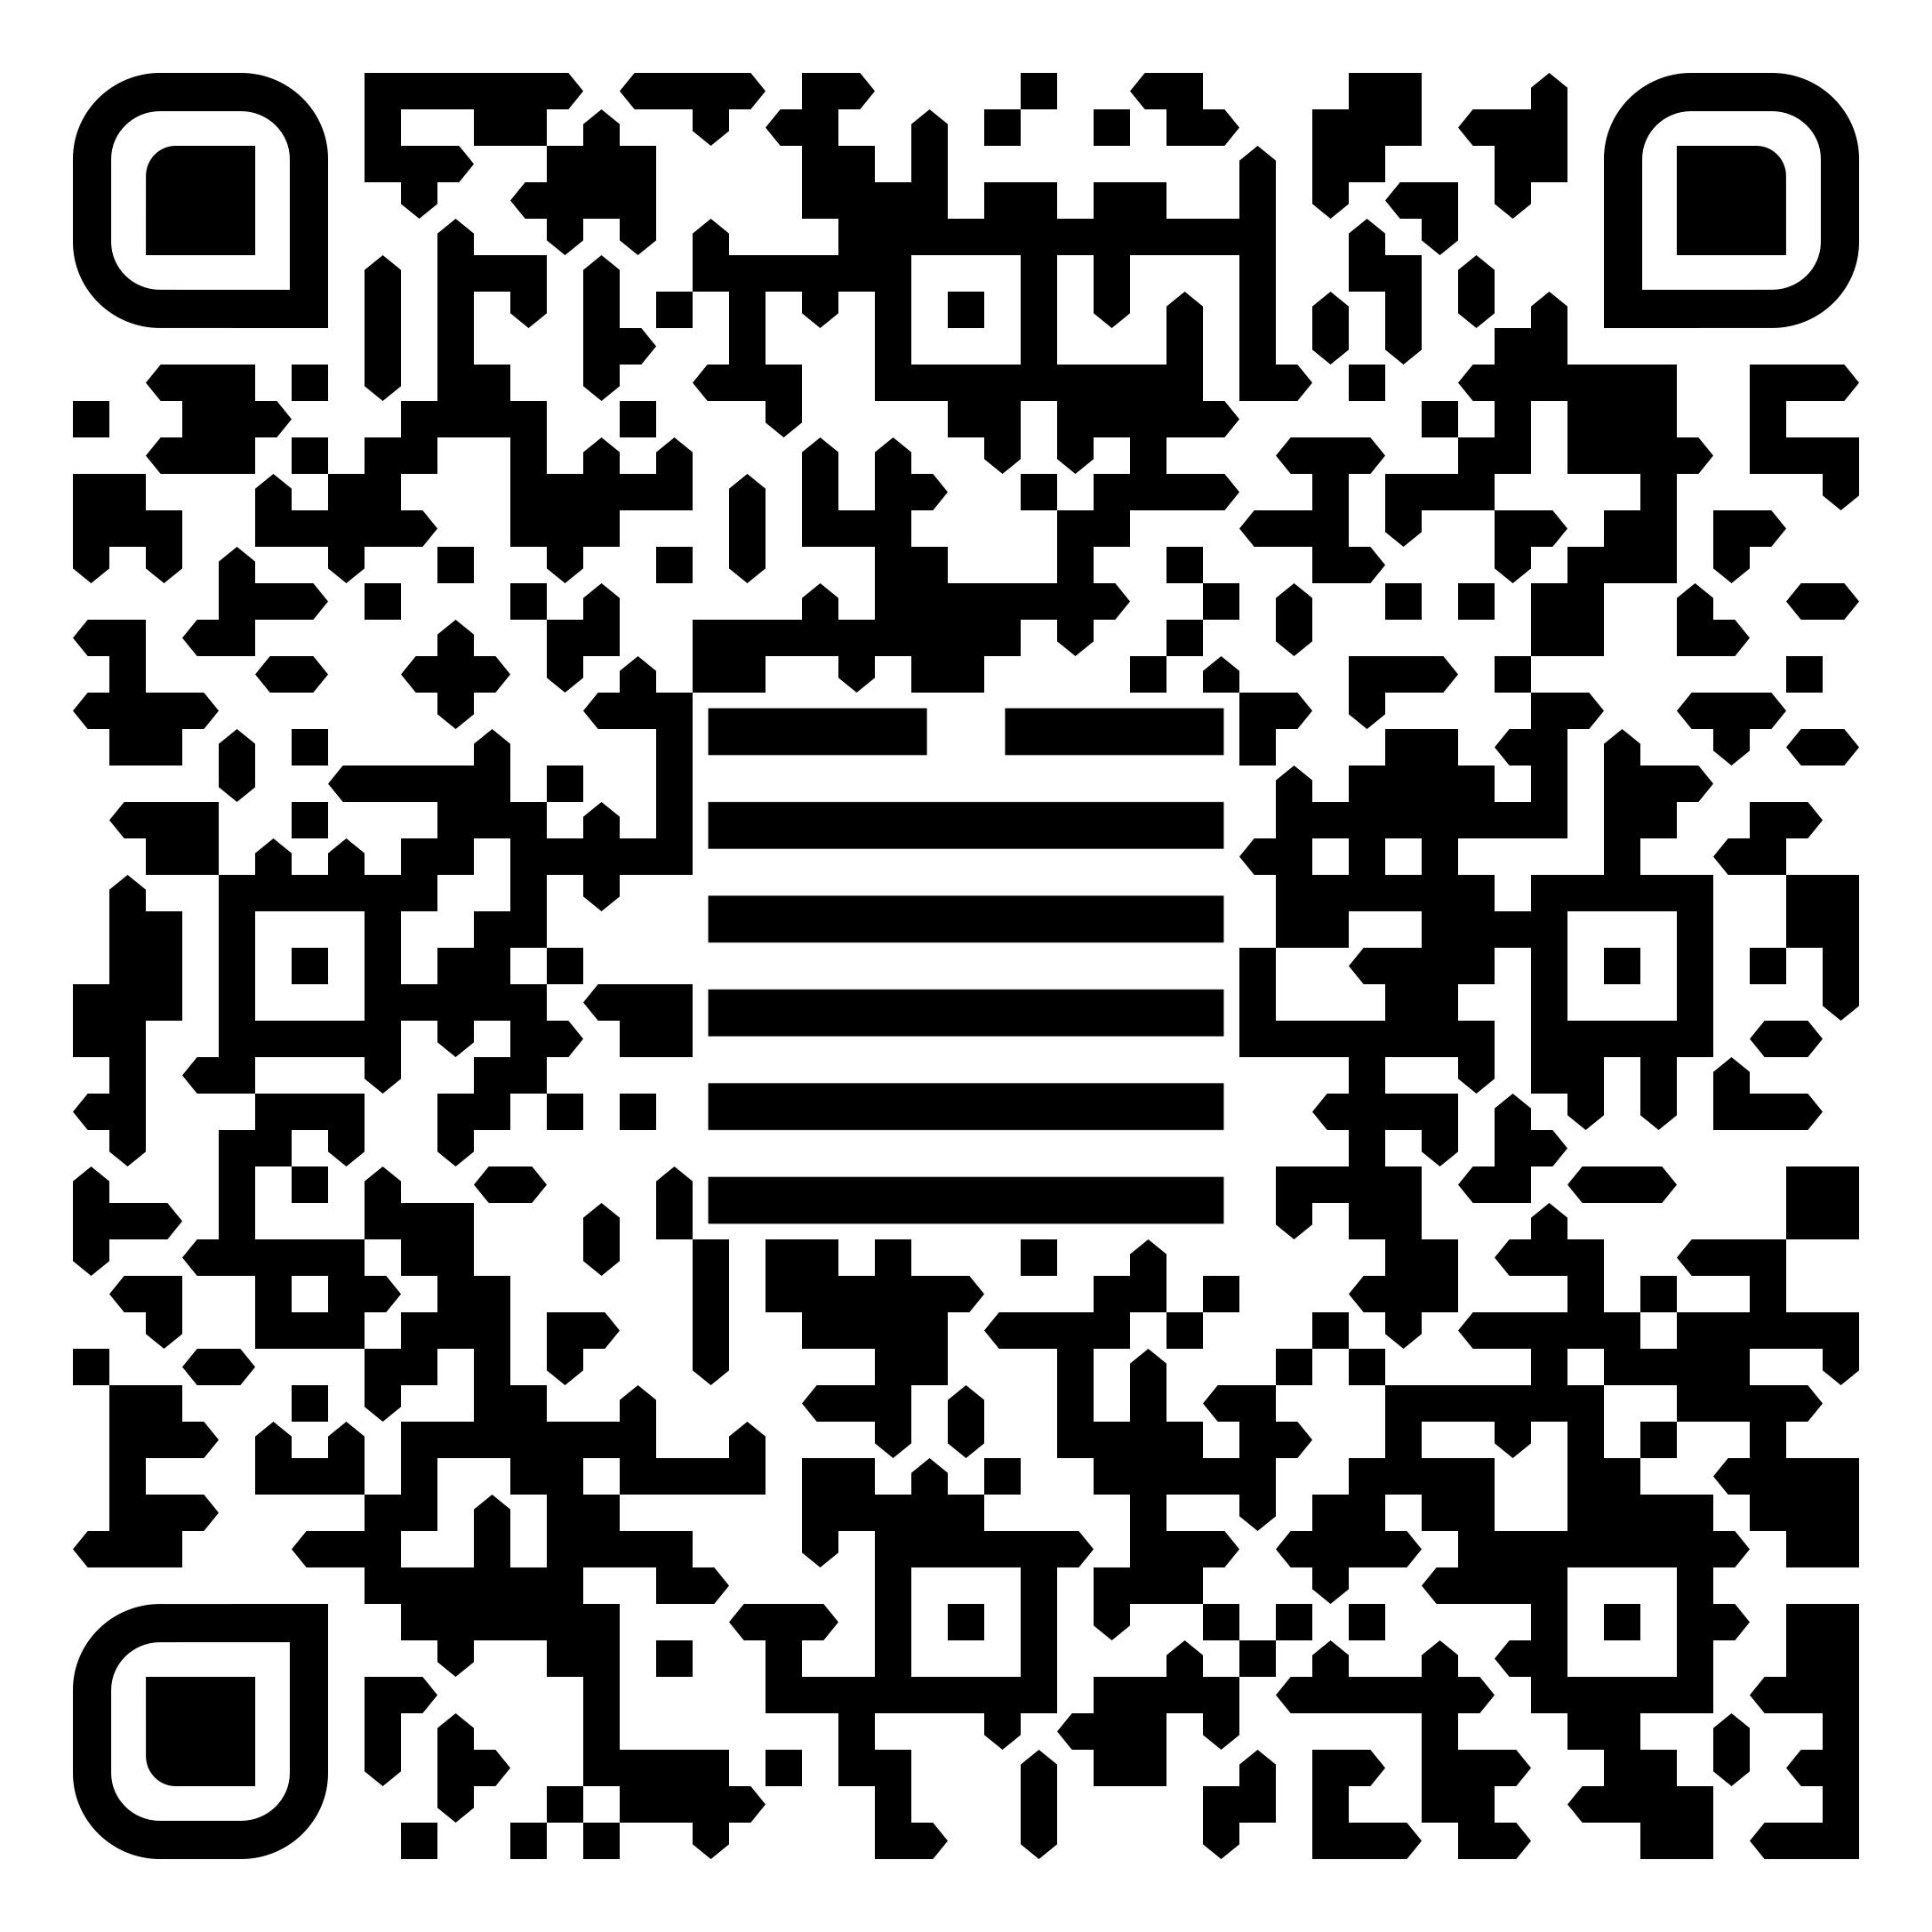 qr-code-43.png